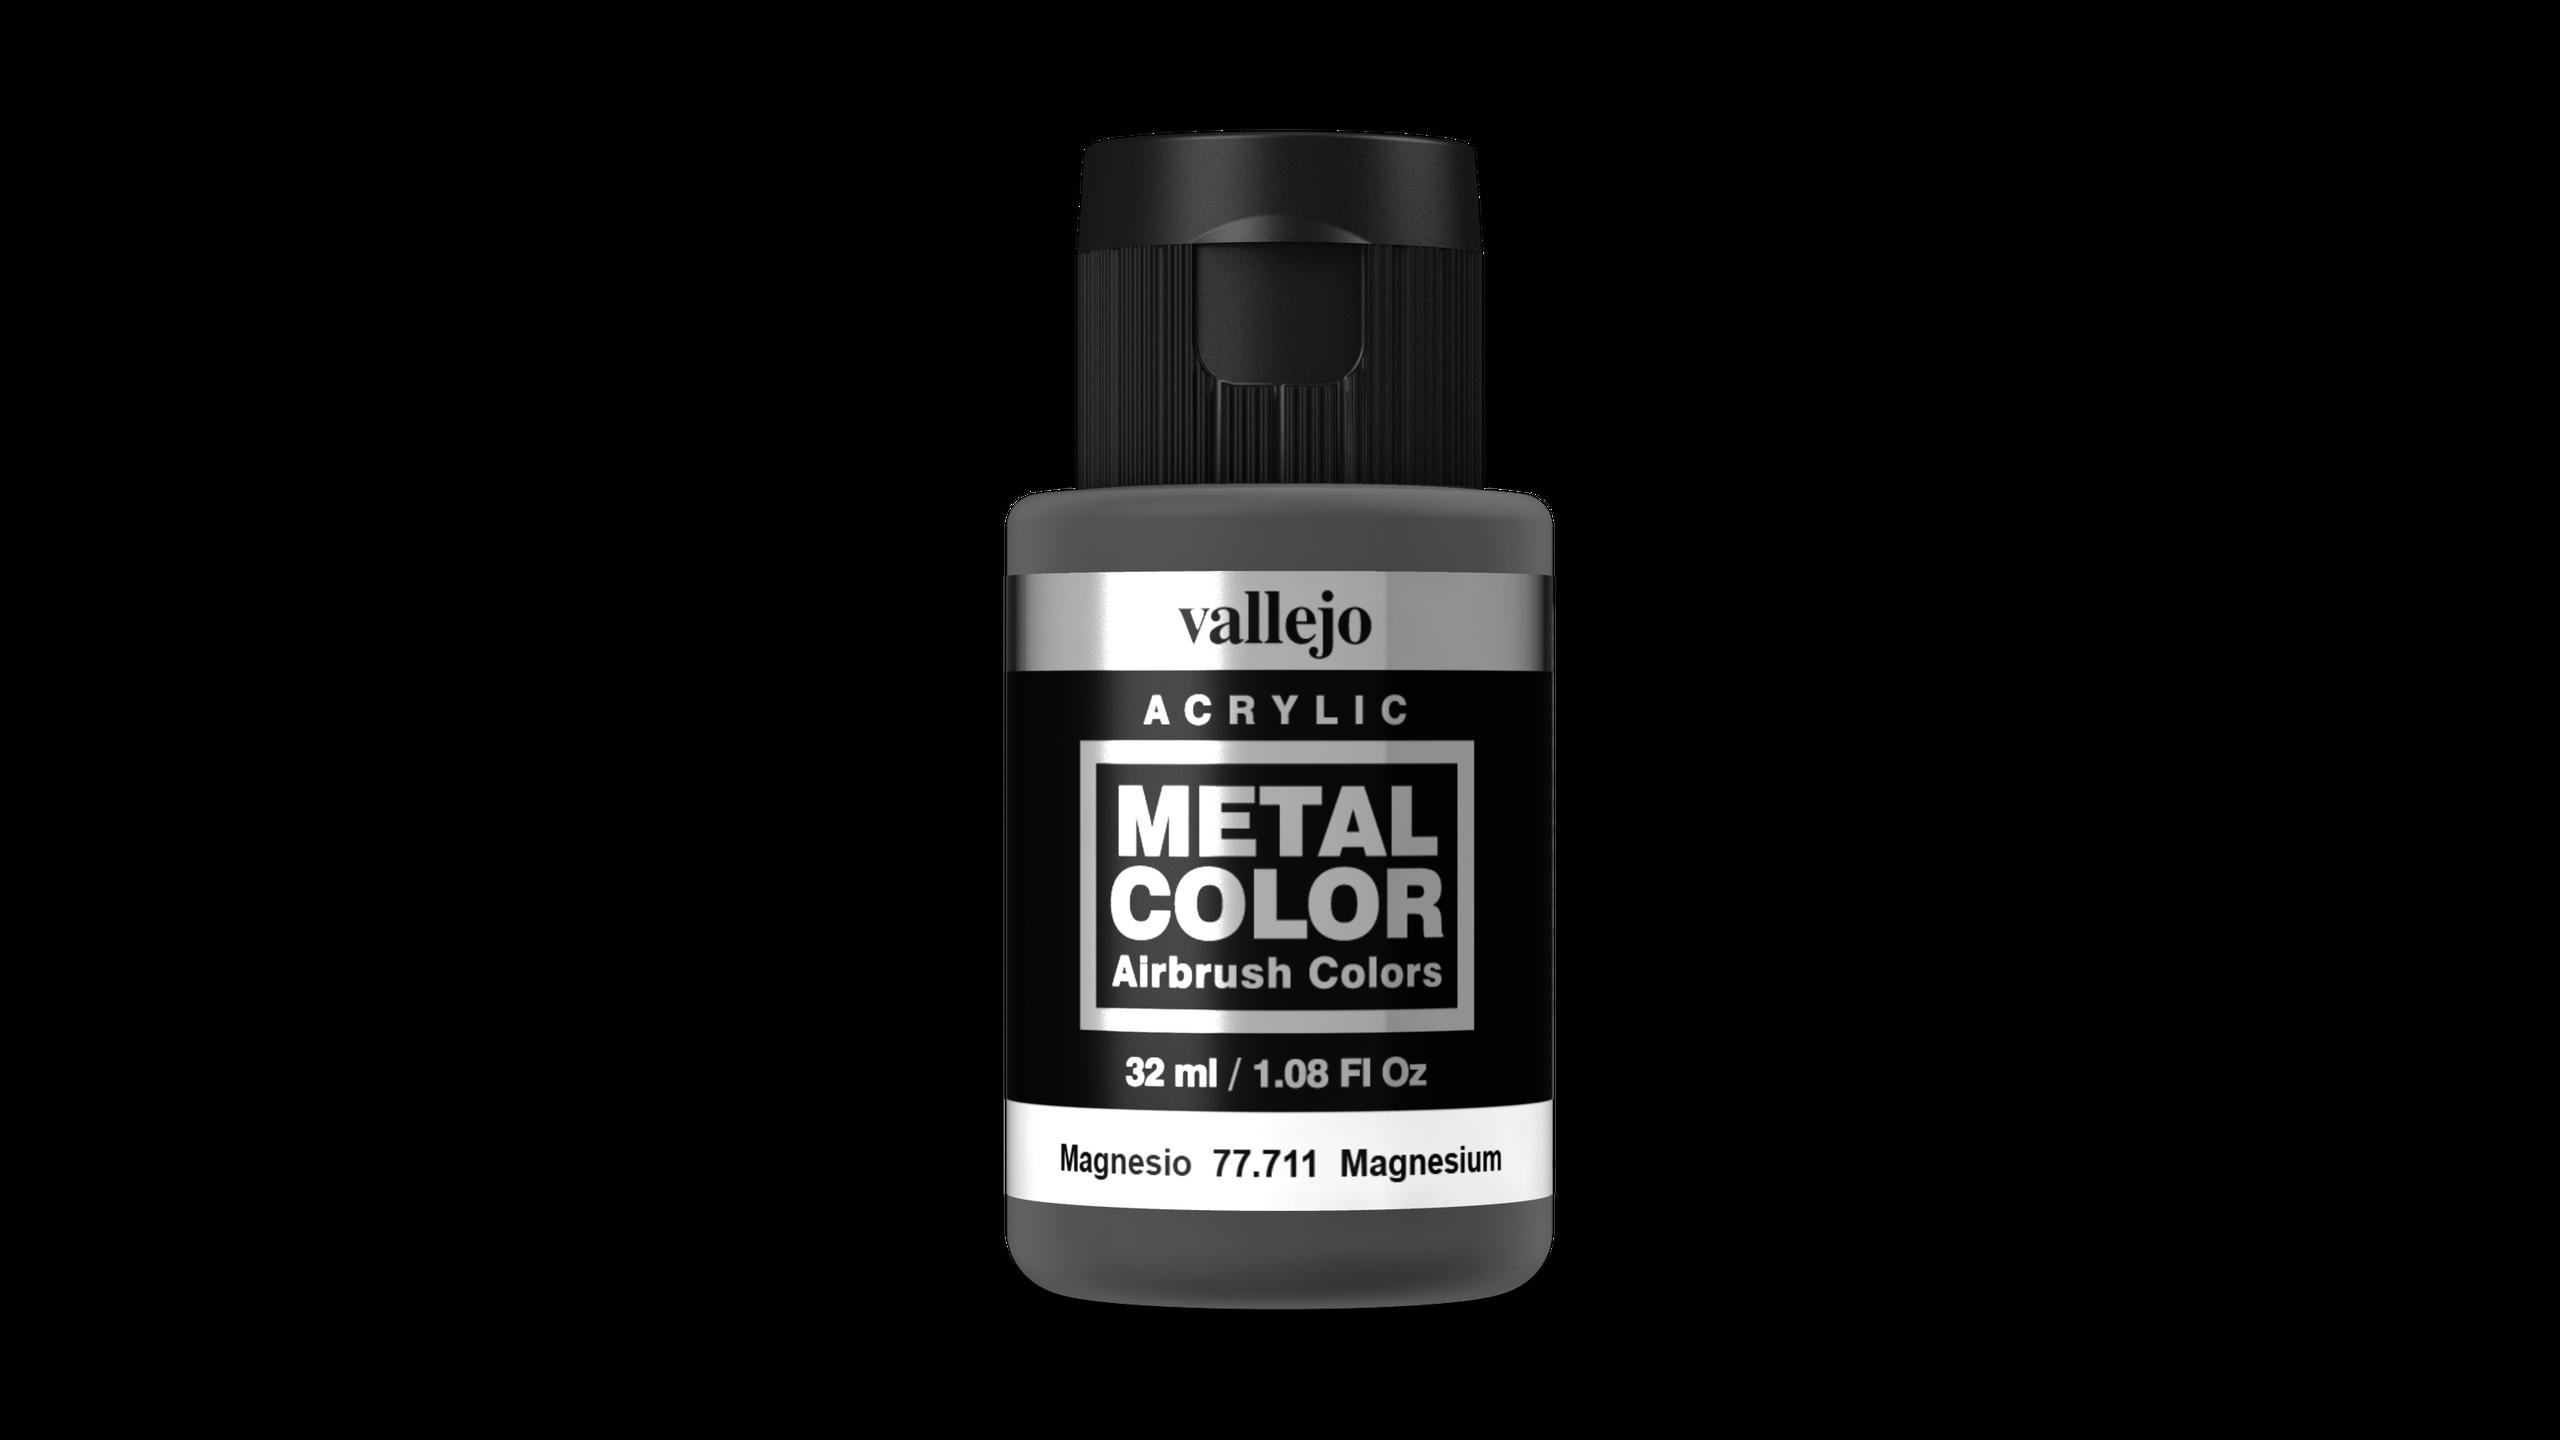 Vallejo Metal Colors 711 Magnesium 32ml Airbrush Farbe